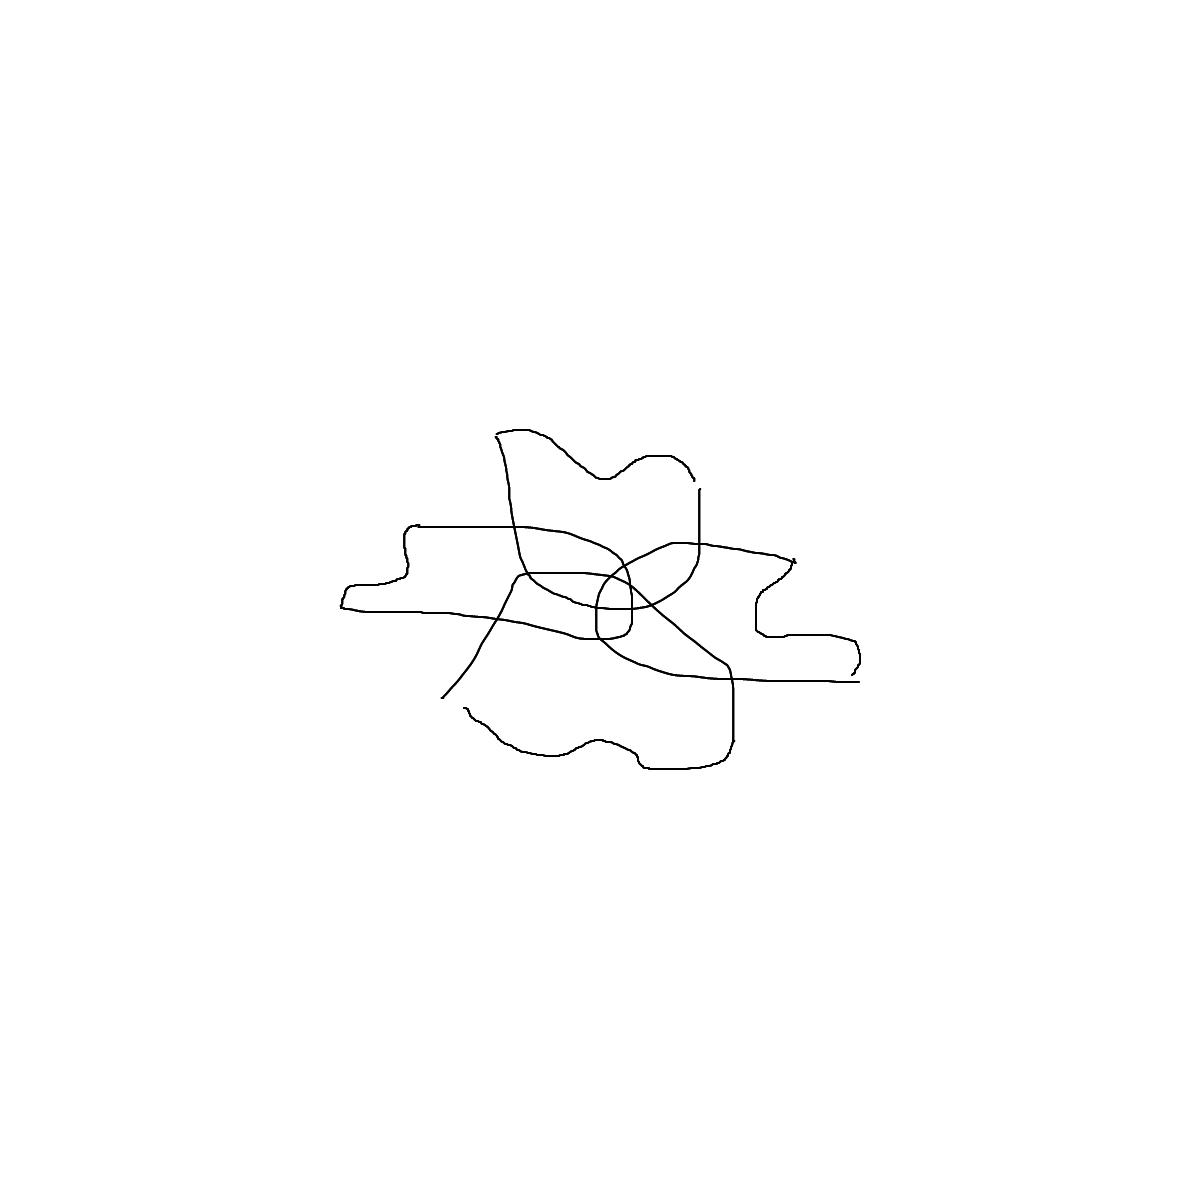 BAAAM drawing#12007 lat:36.8016891479492200lng: -119.7784118652343800